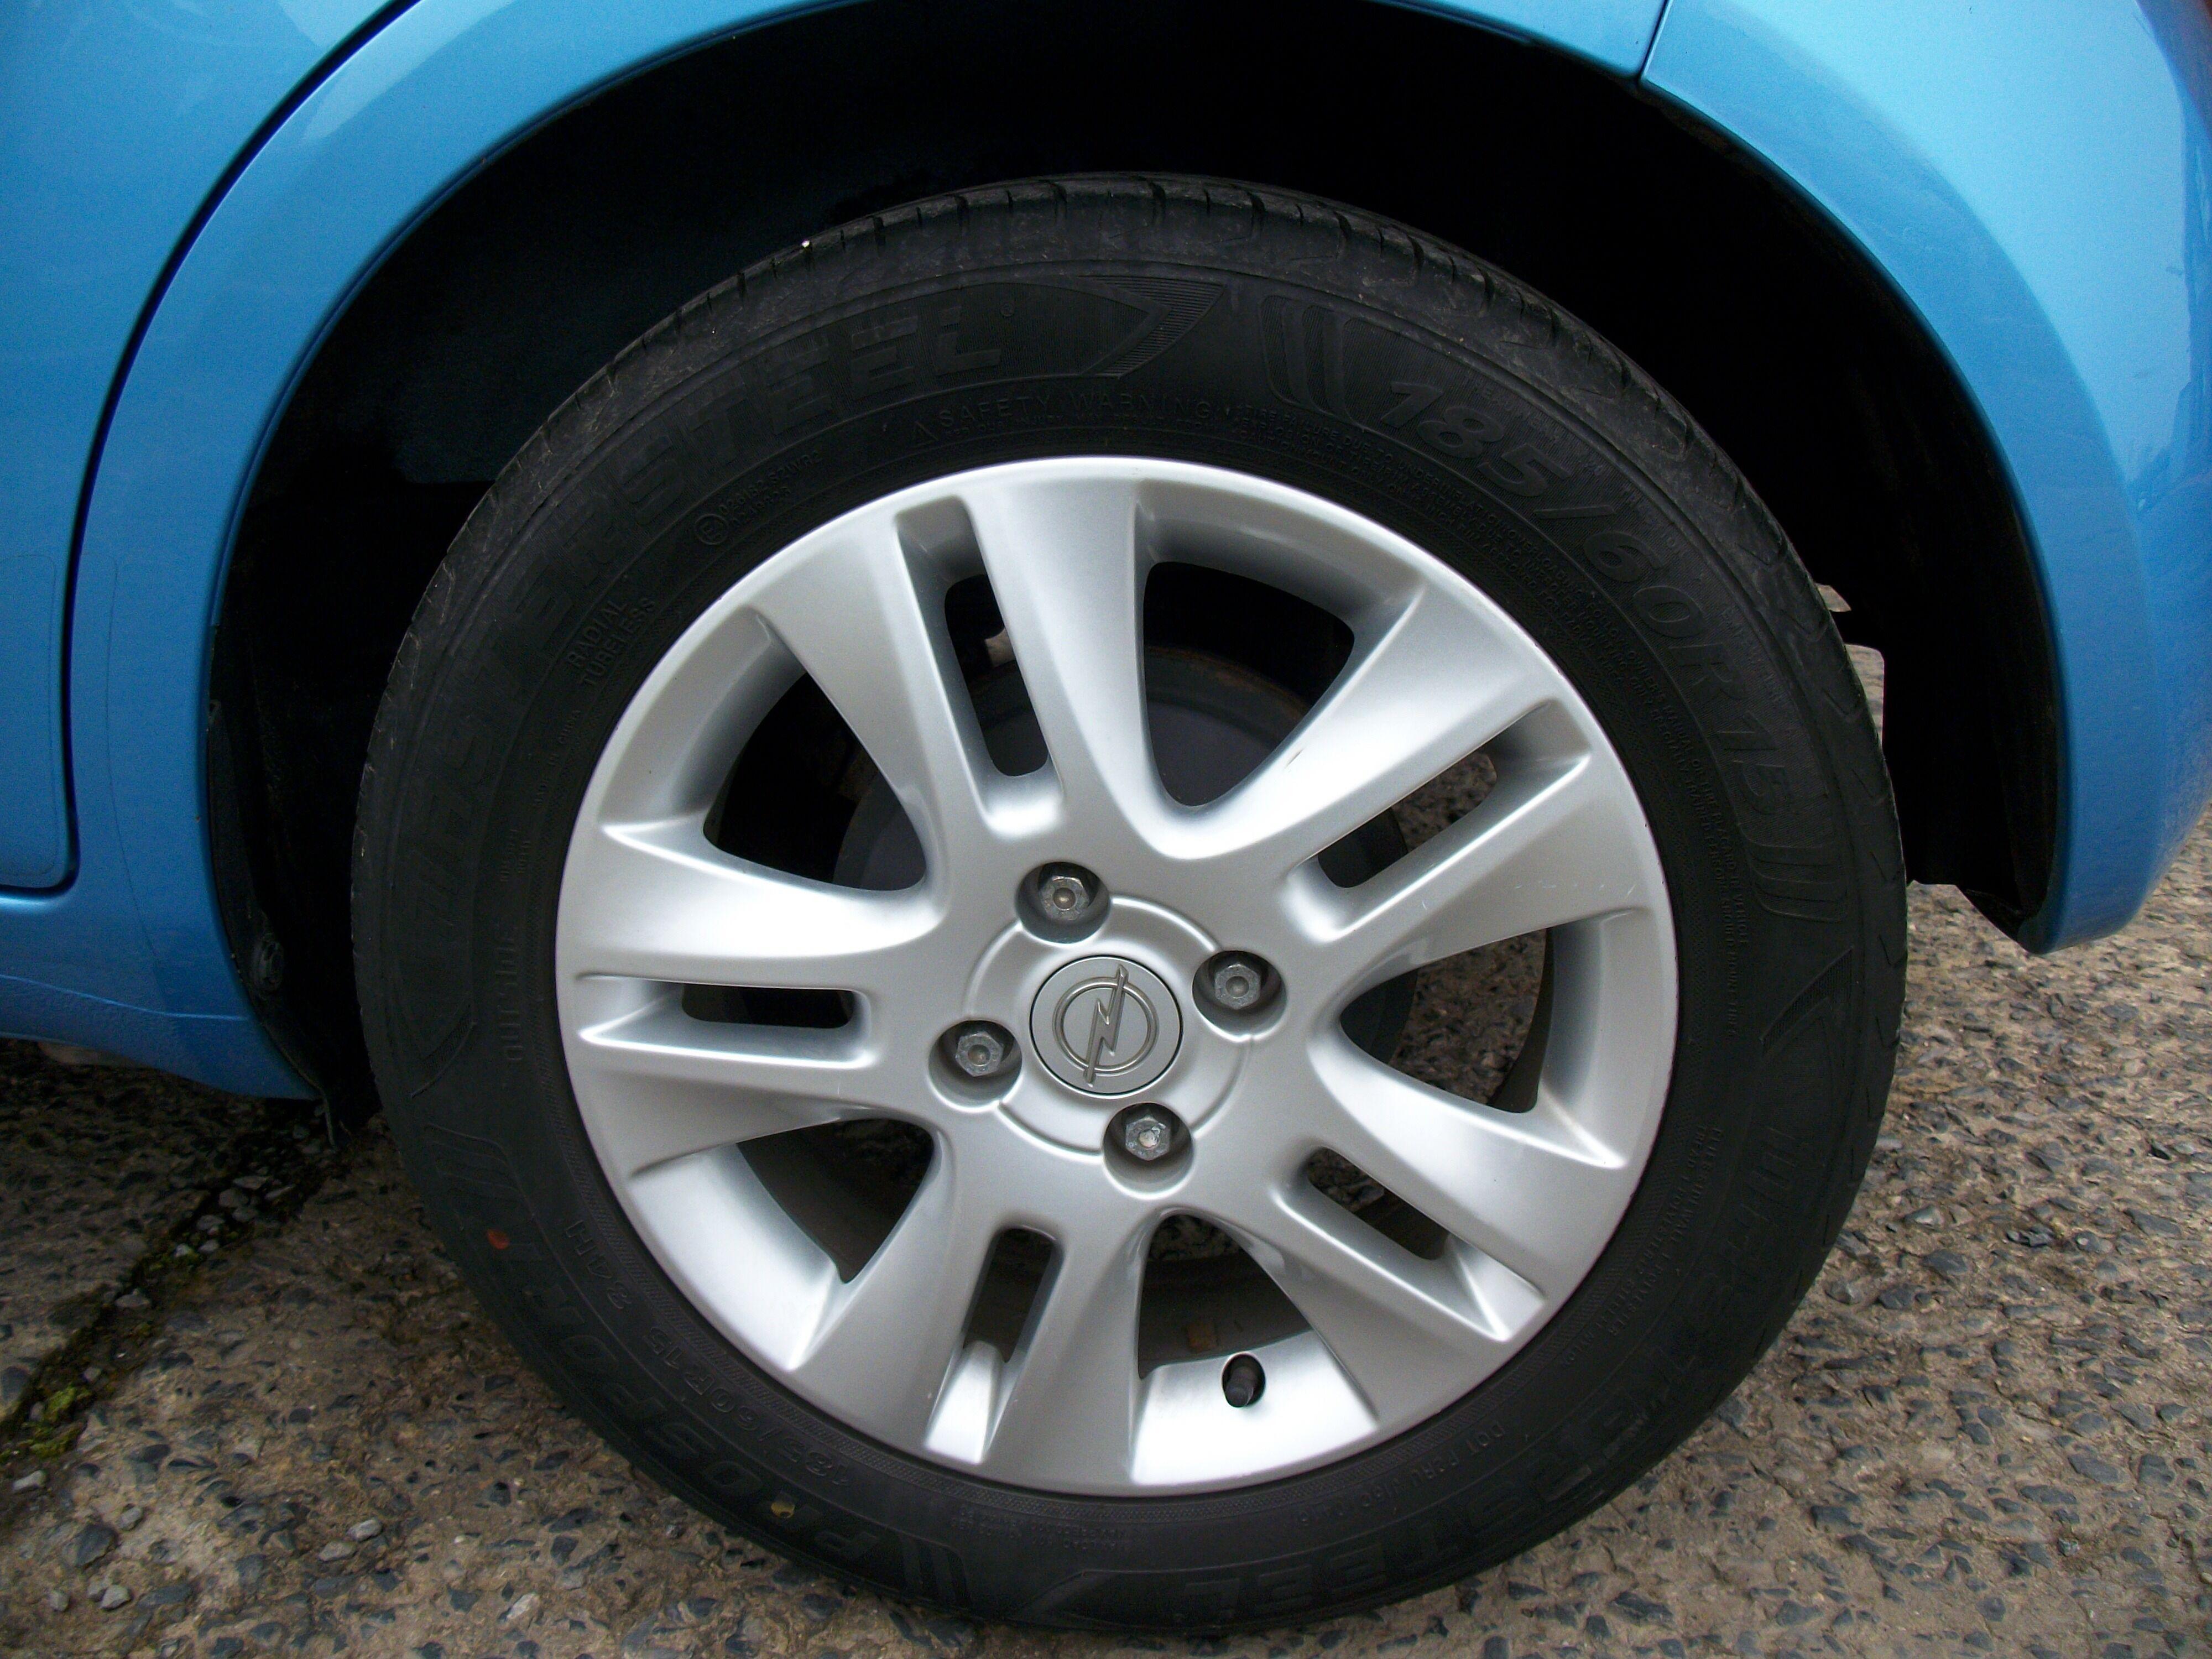 Opel Agila 1.2 Benz 2/9